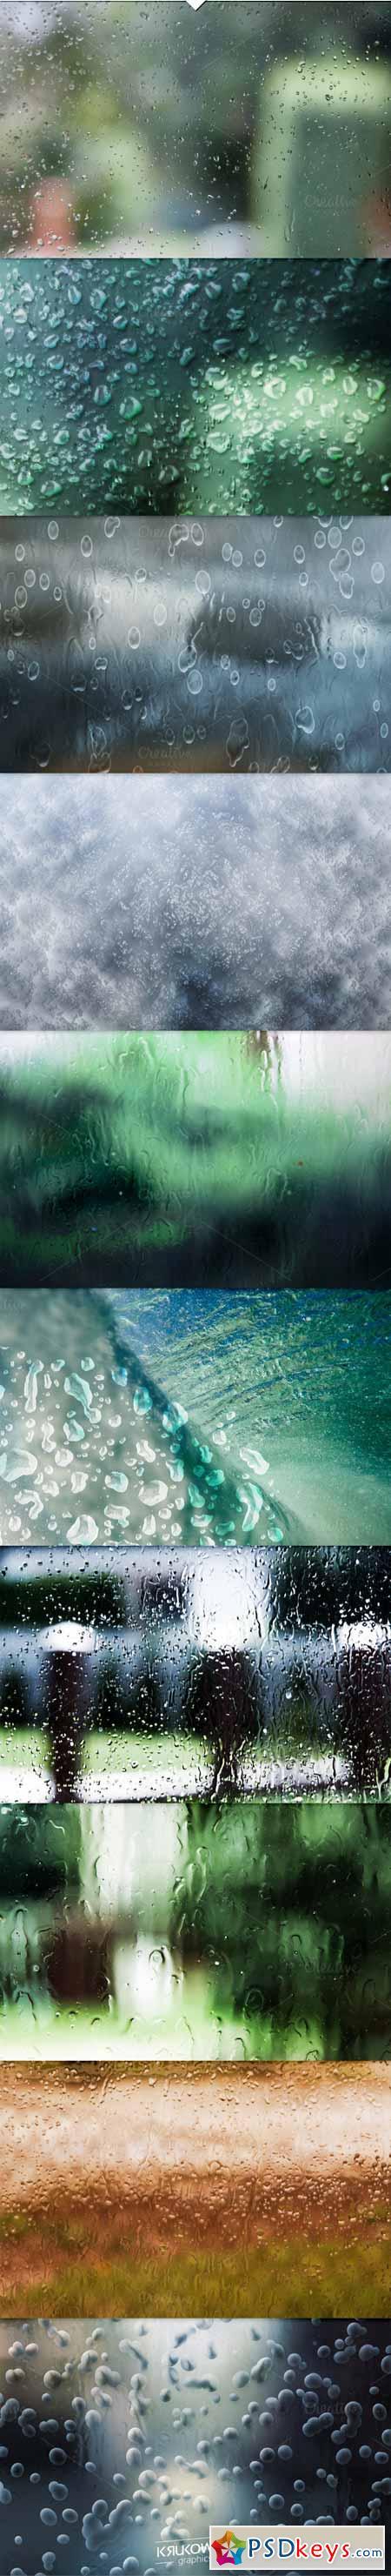 Water Drops PSD Backdrop 394477